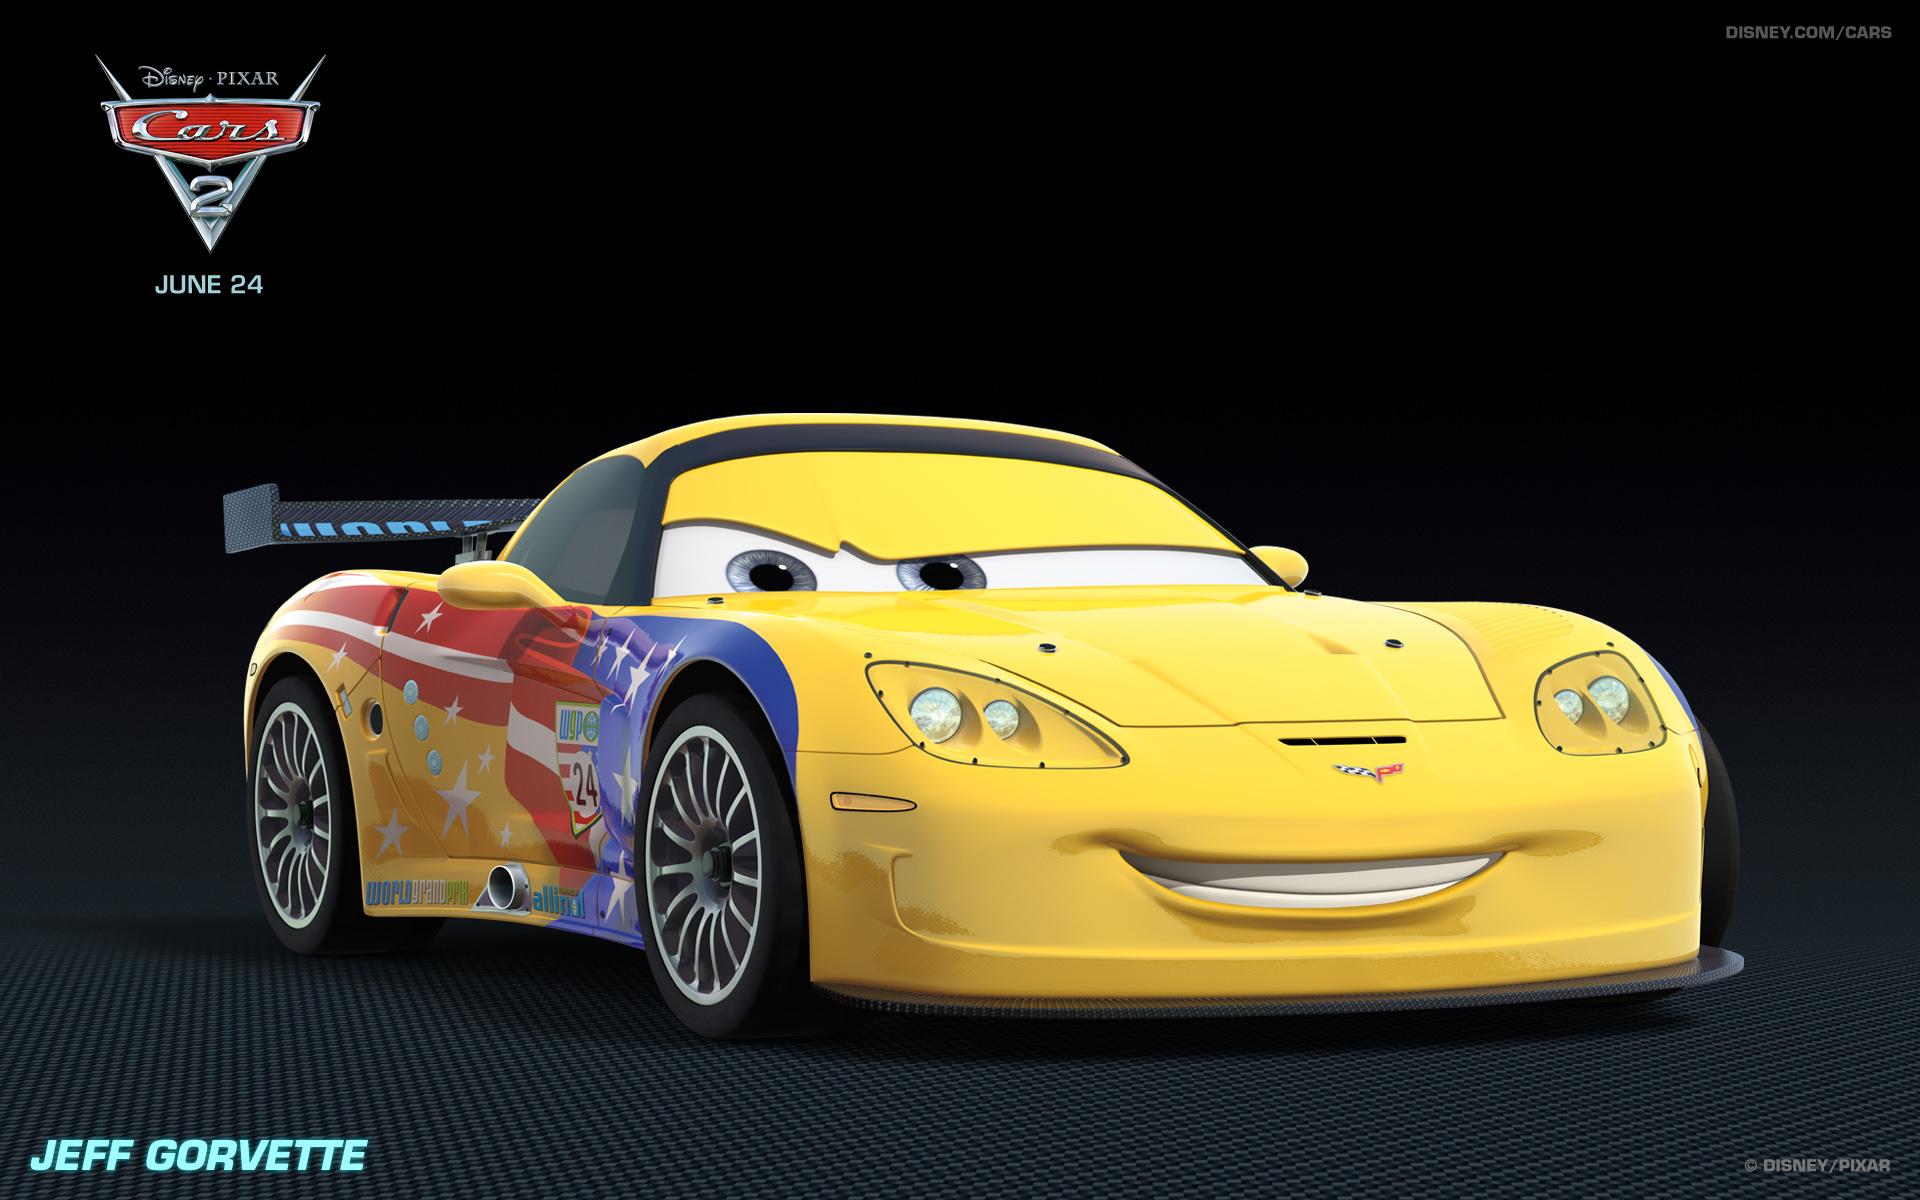 Cars 2 - Jeff Gorvette - Disney